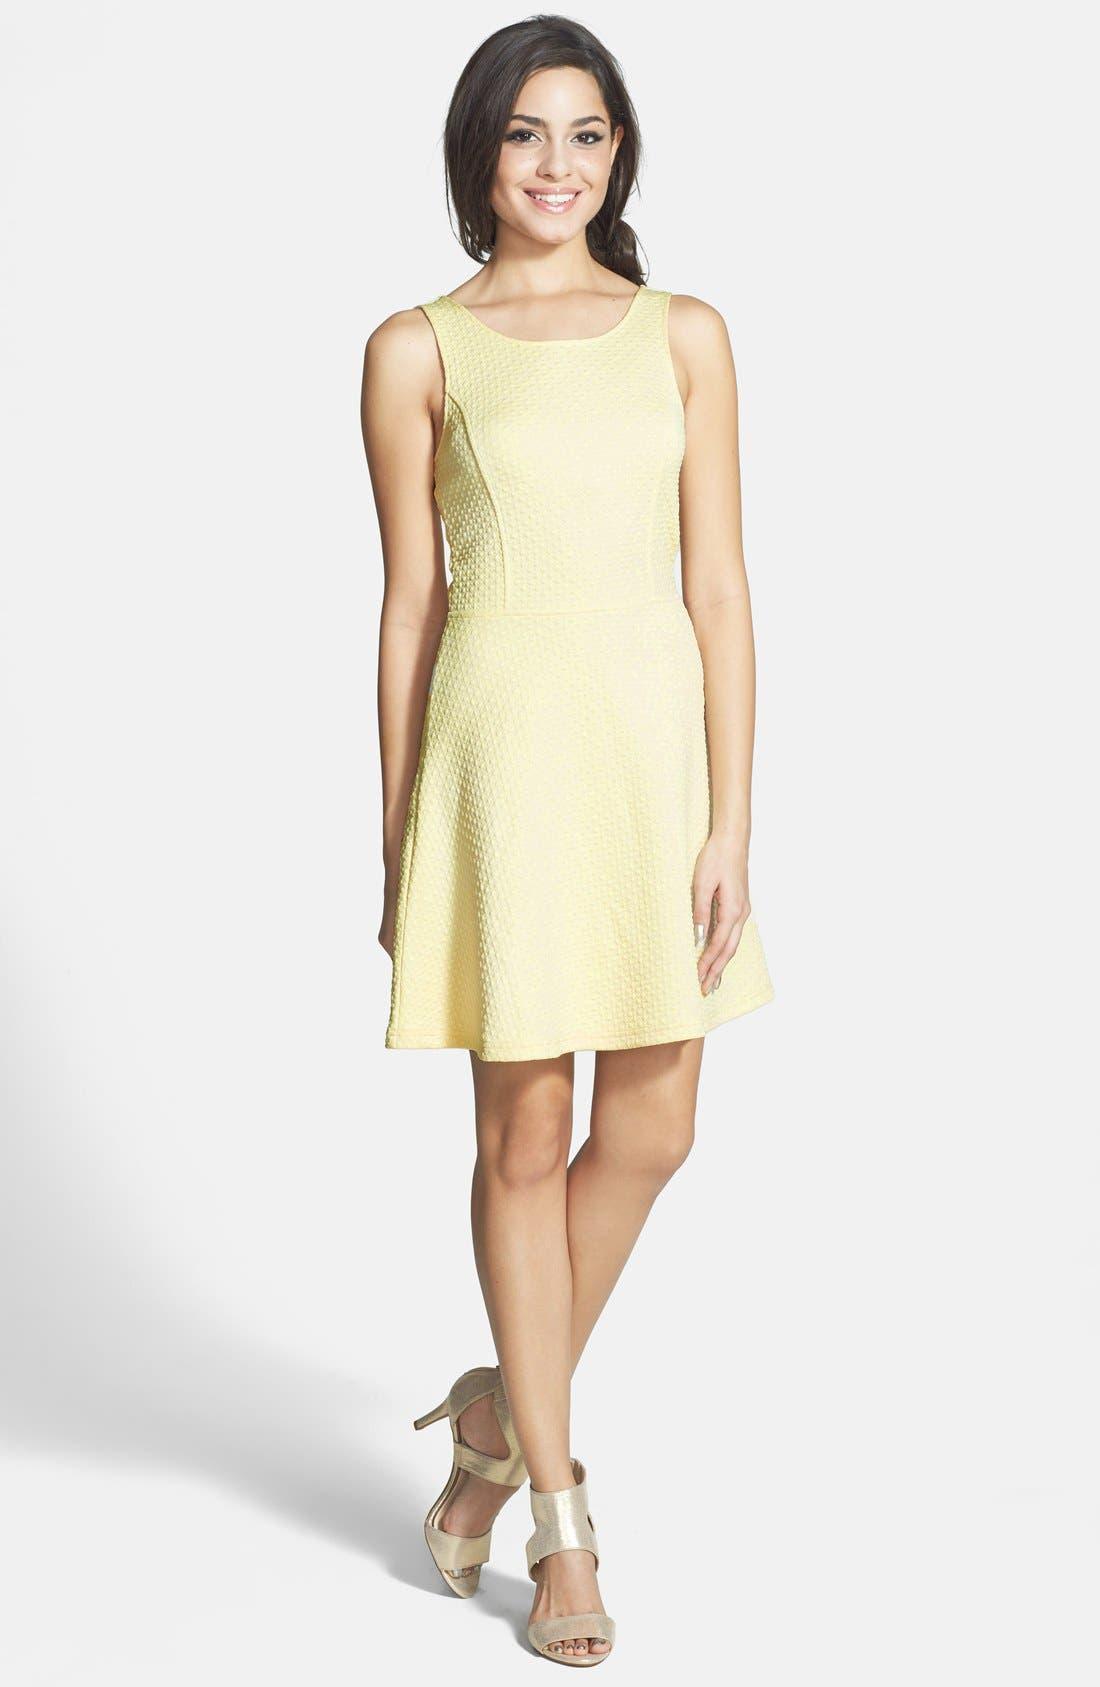 Alternate Image 1 Selected - Frenchi® 'Spring Dot' Cutout Back Skater Dress (Juniors)